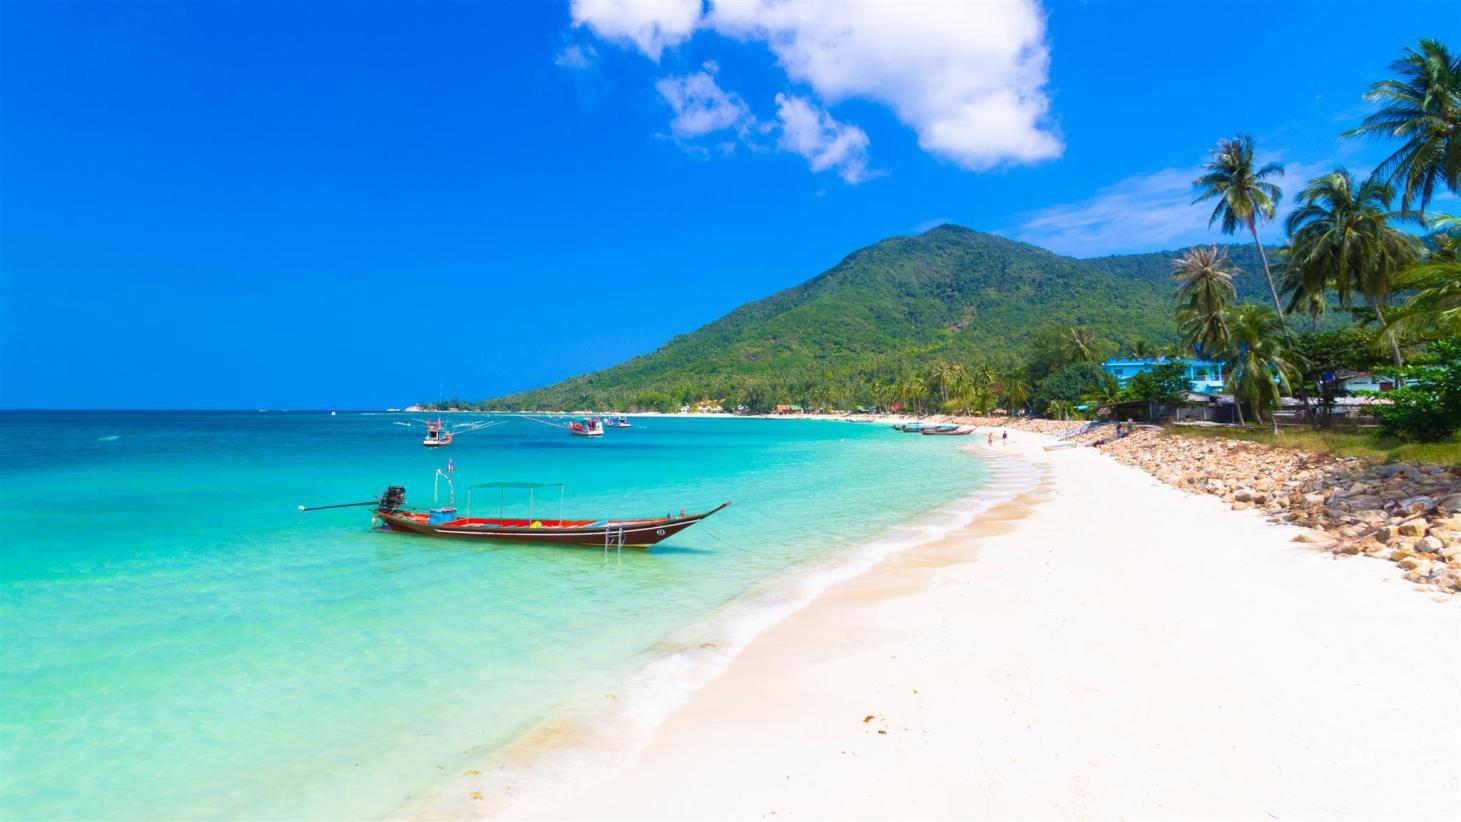 10 Best Koh Phangan Hotels Hd Photos Reviews Of Hotels In